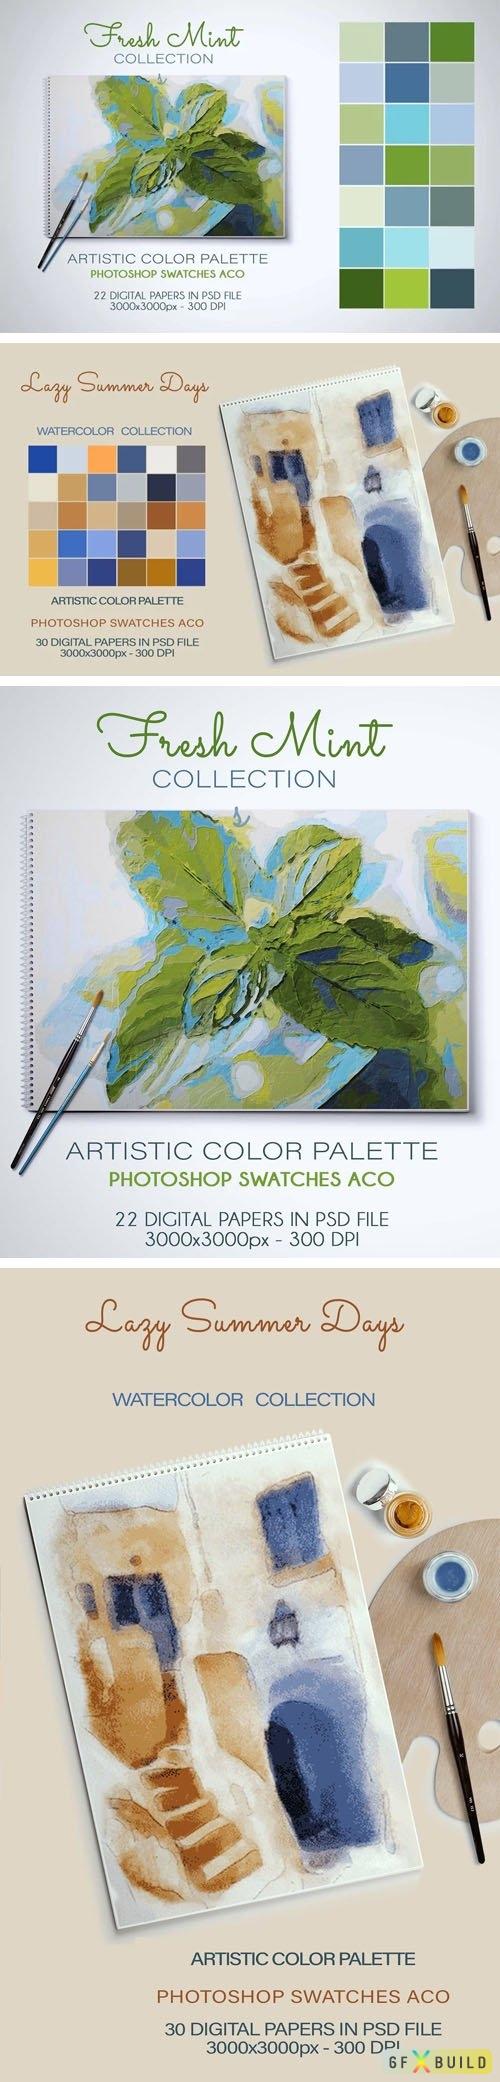 Artistic Color Palettes - Photoshop Swatches ACO